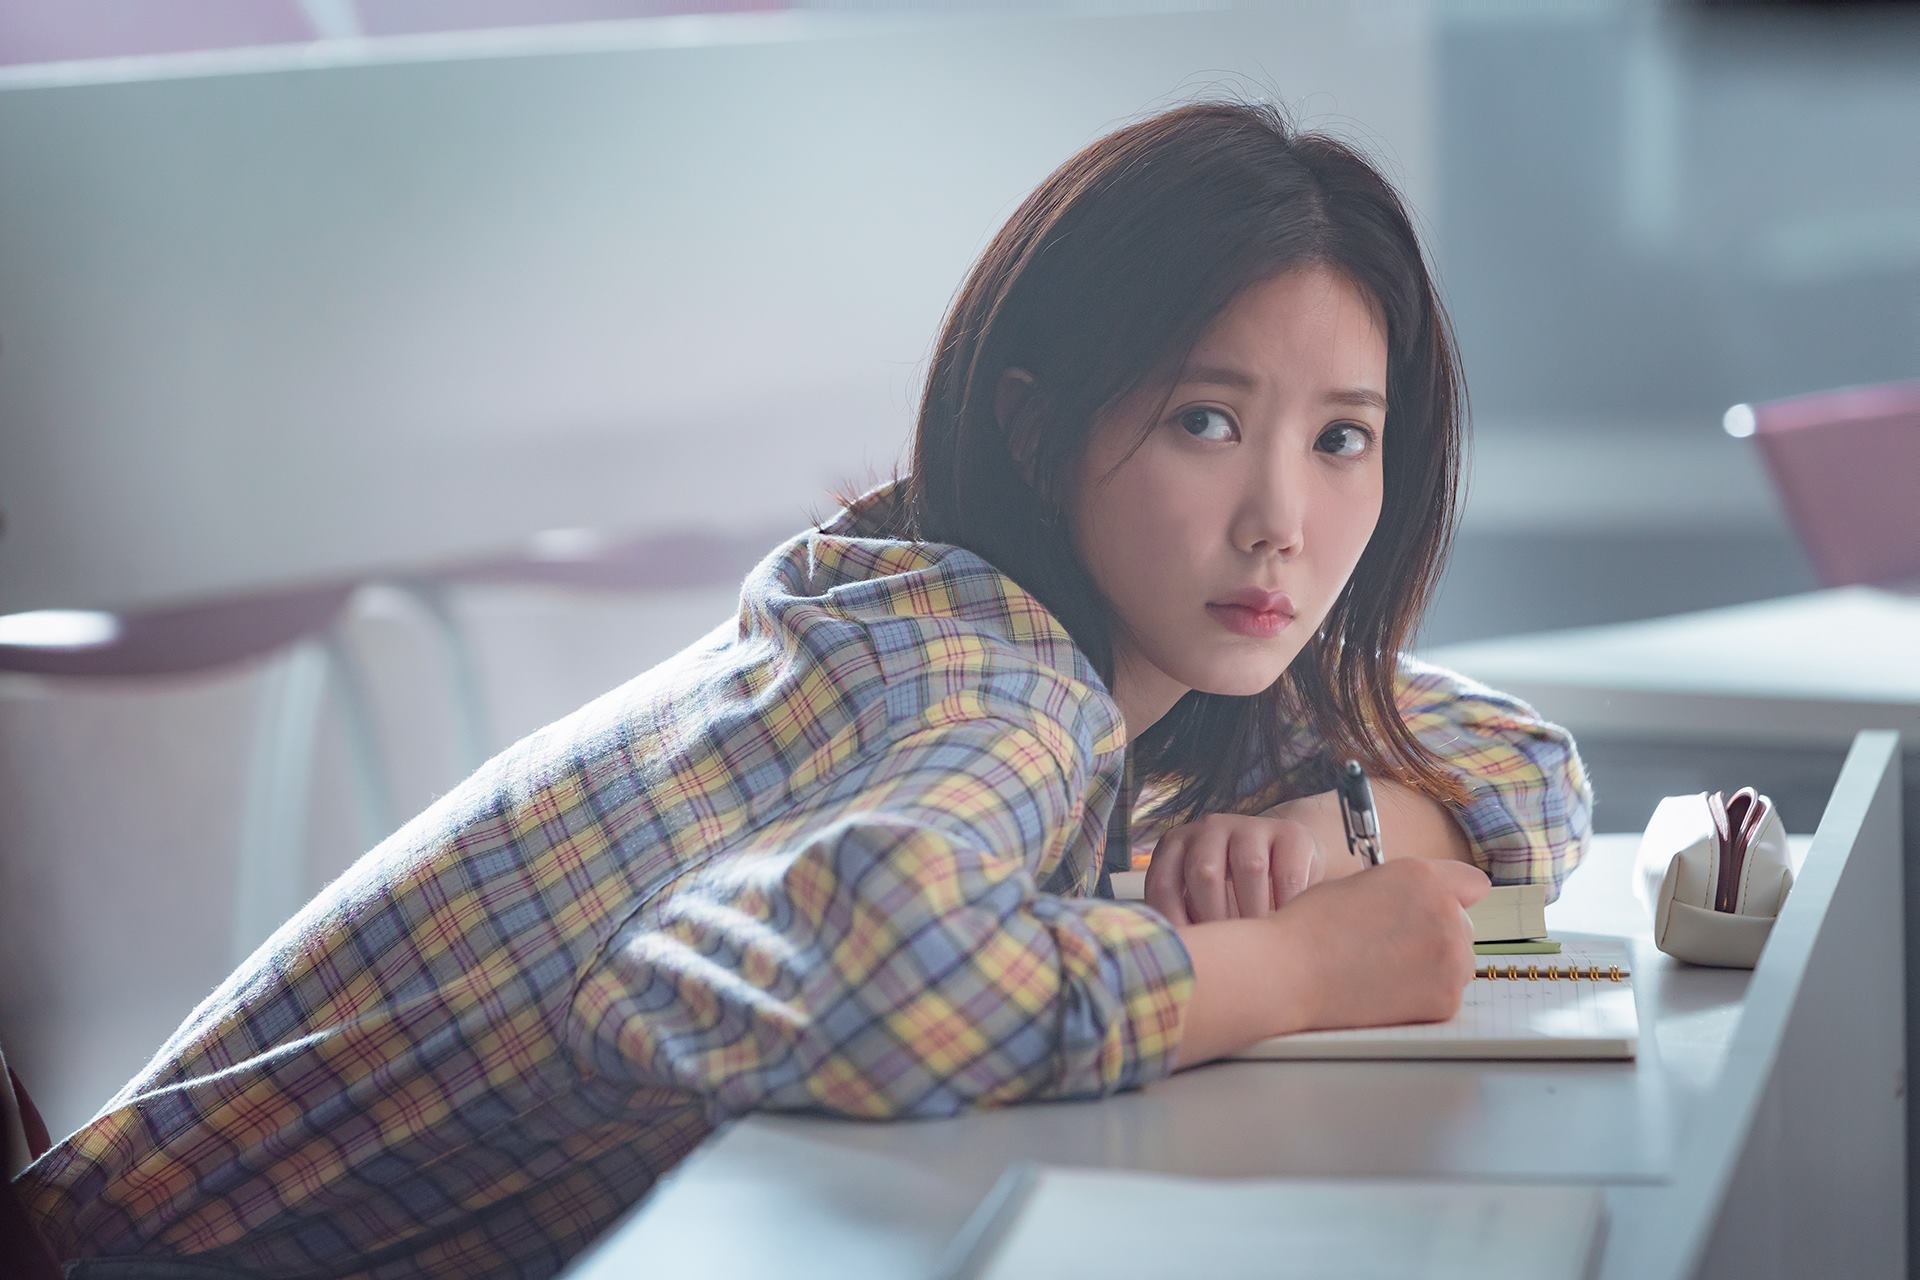 phim hàn quốc My ID Is Gangnam Beauty